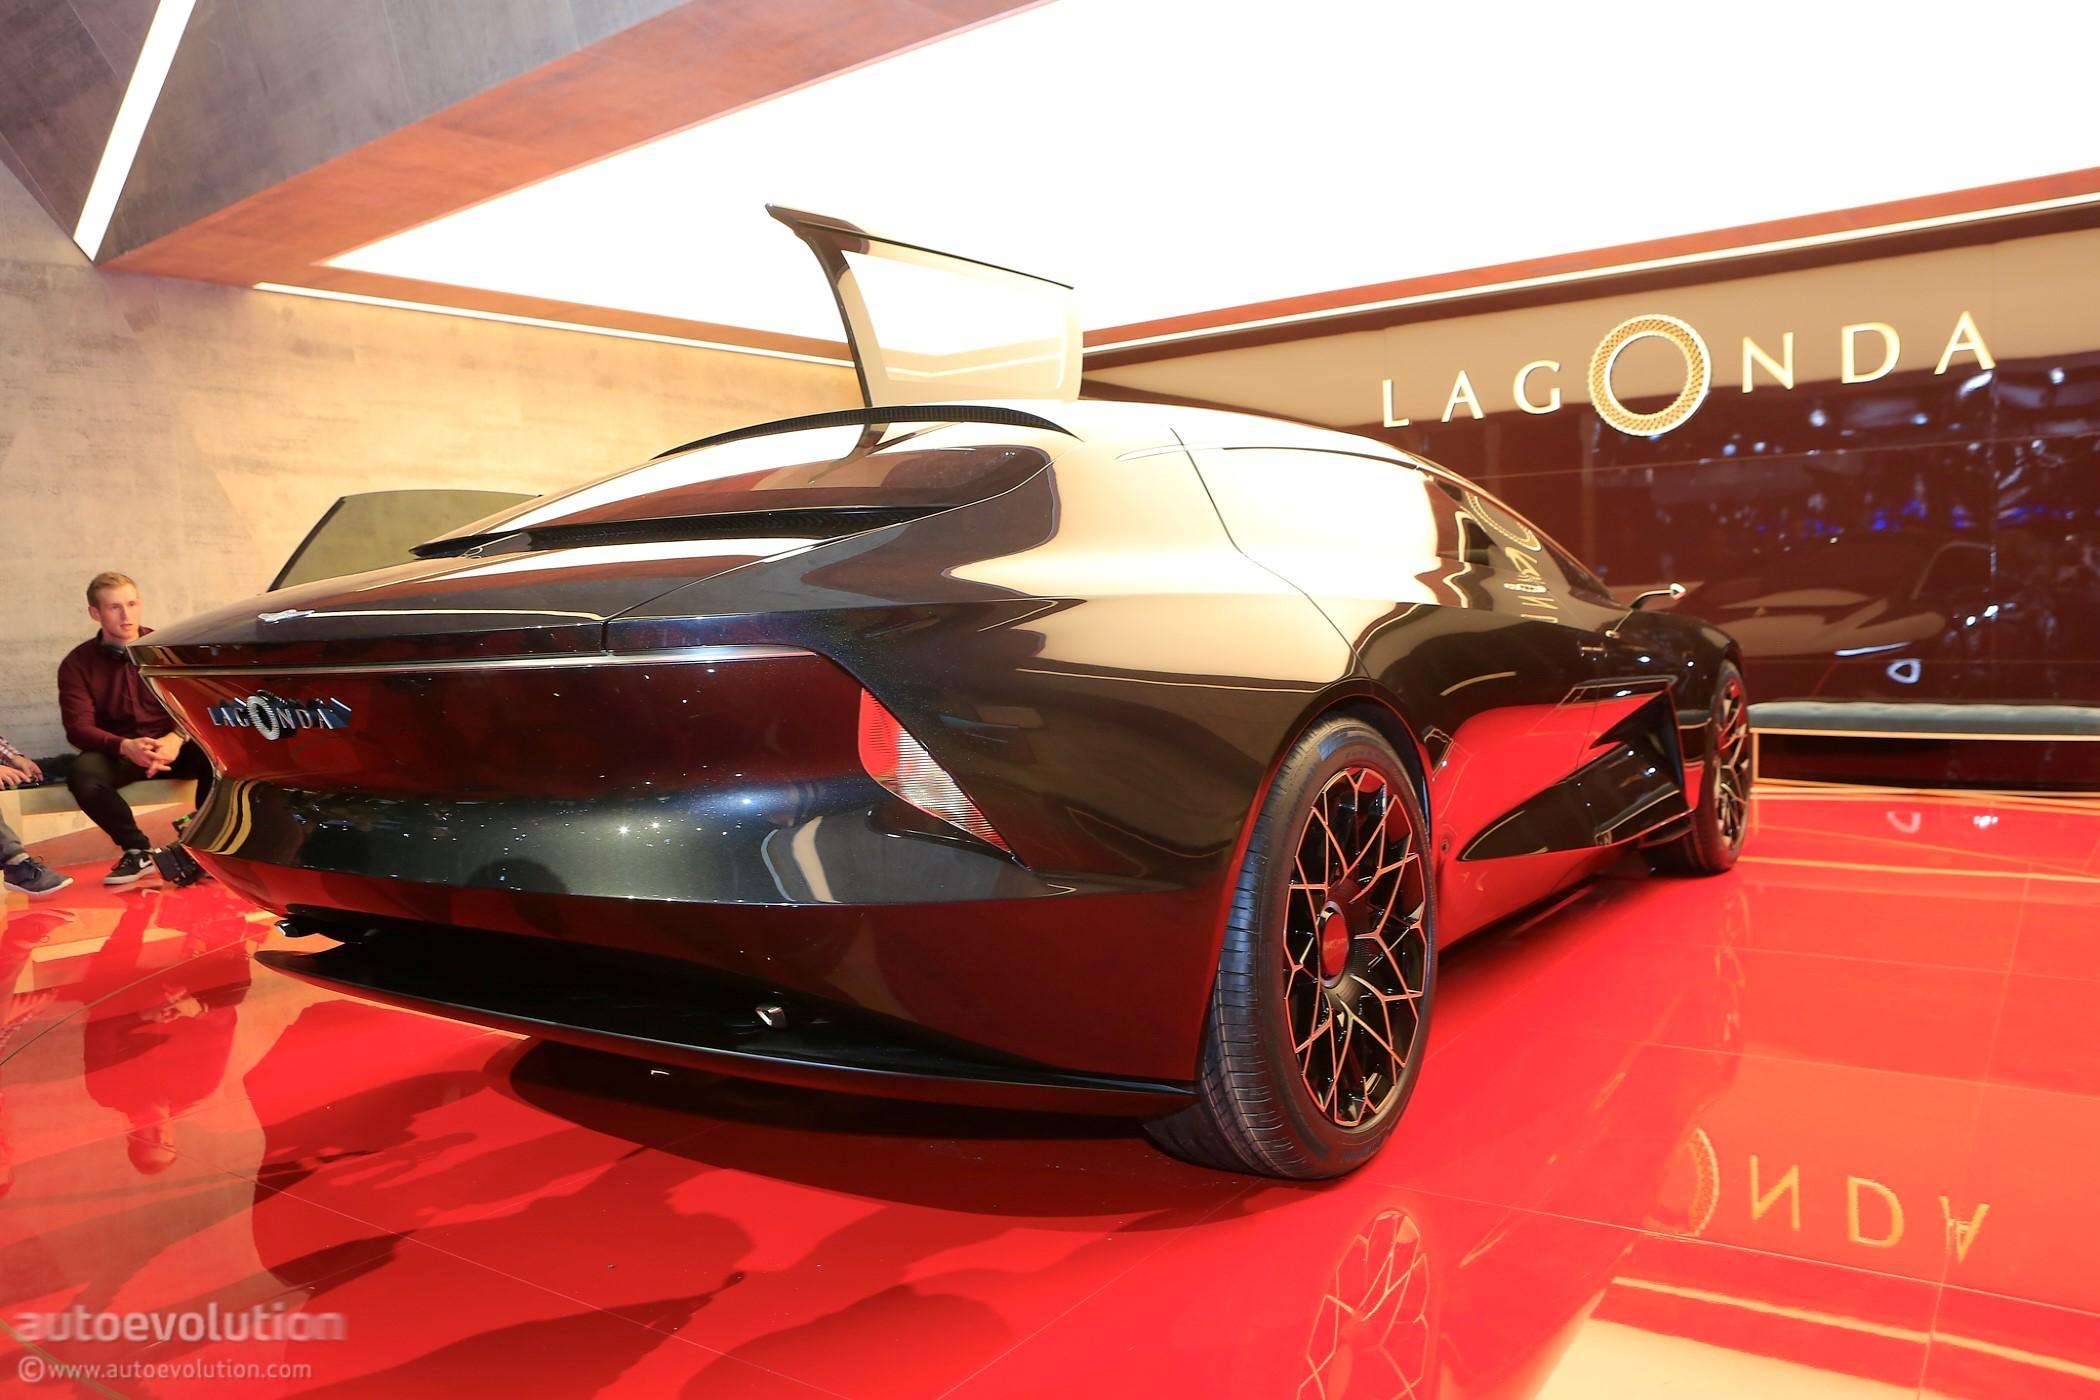 Lagonda Vision Concept Lands In Geneva To Wash The Sins Of ...